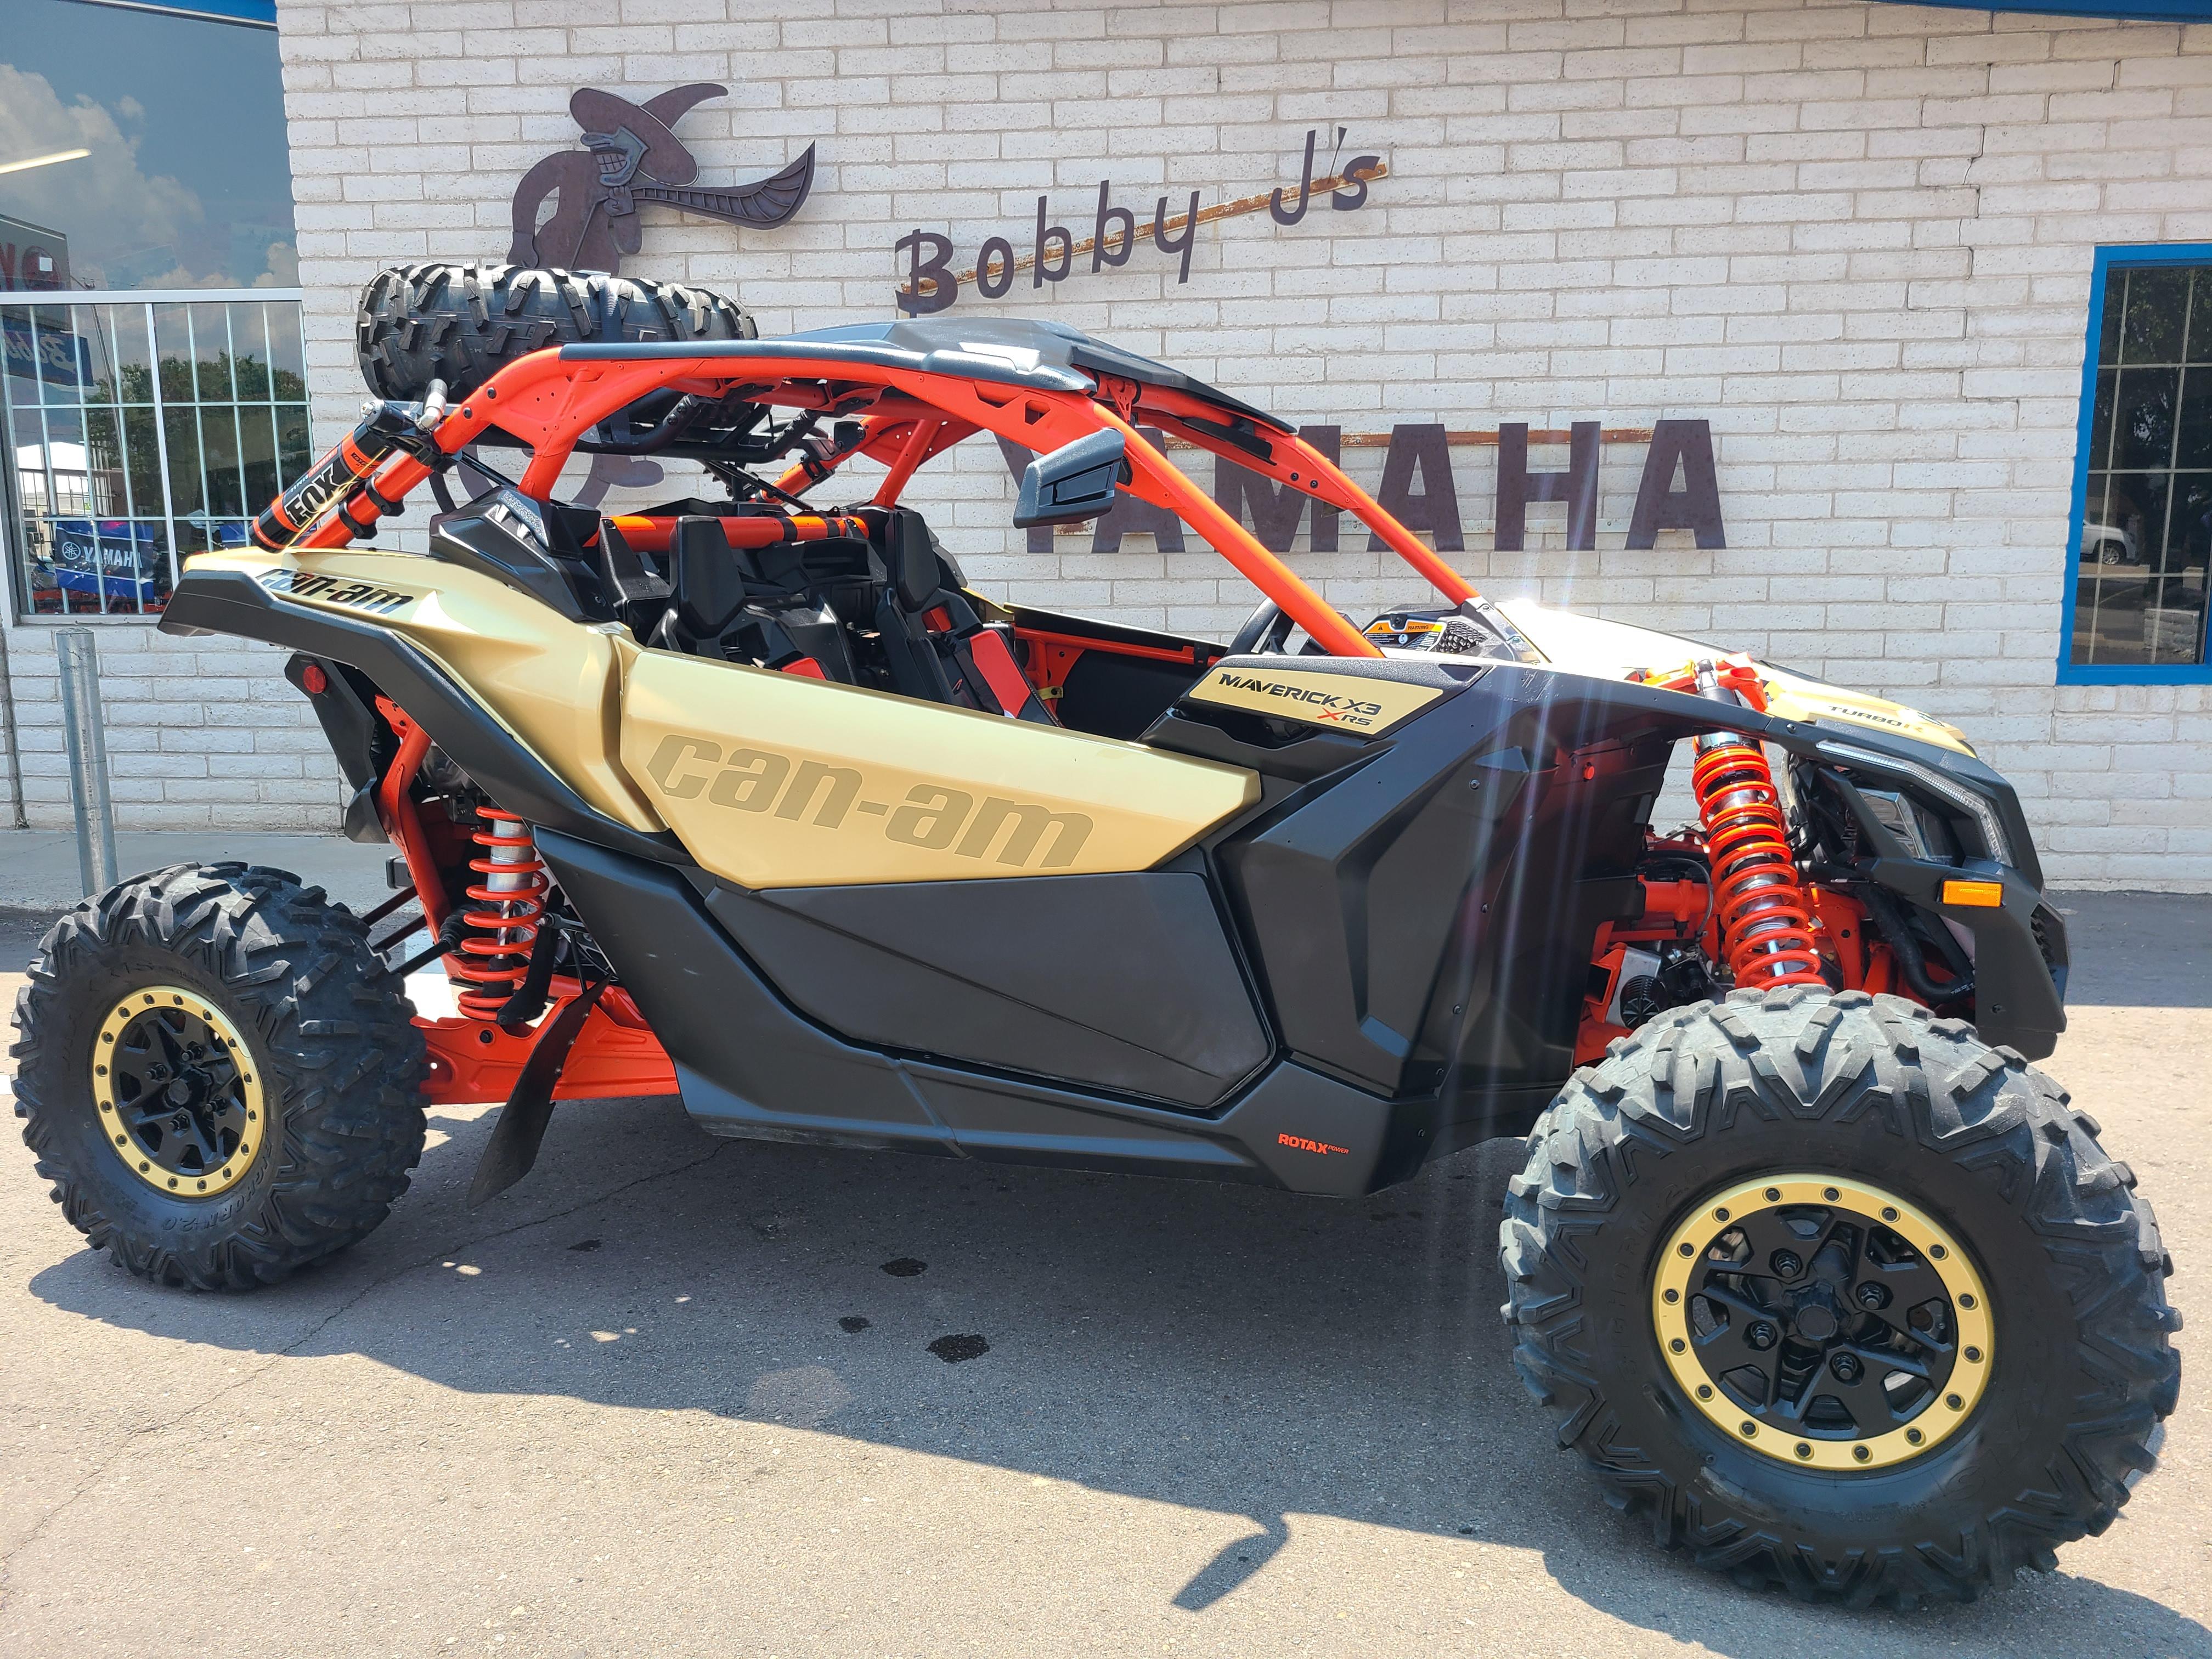 2018 Can-Am Maverick X3 X rs TURBO R at Bobby J's Yamaha, Albuquerque, NM 87110